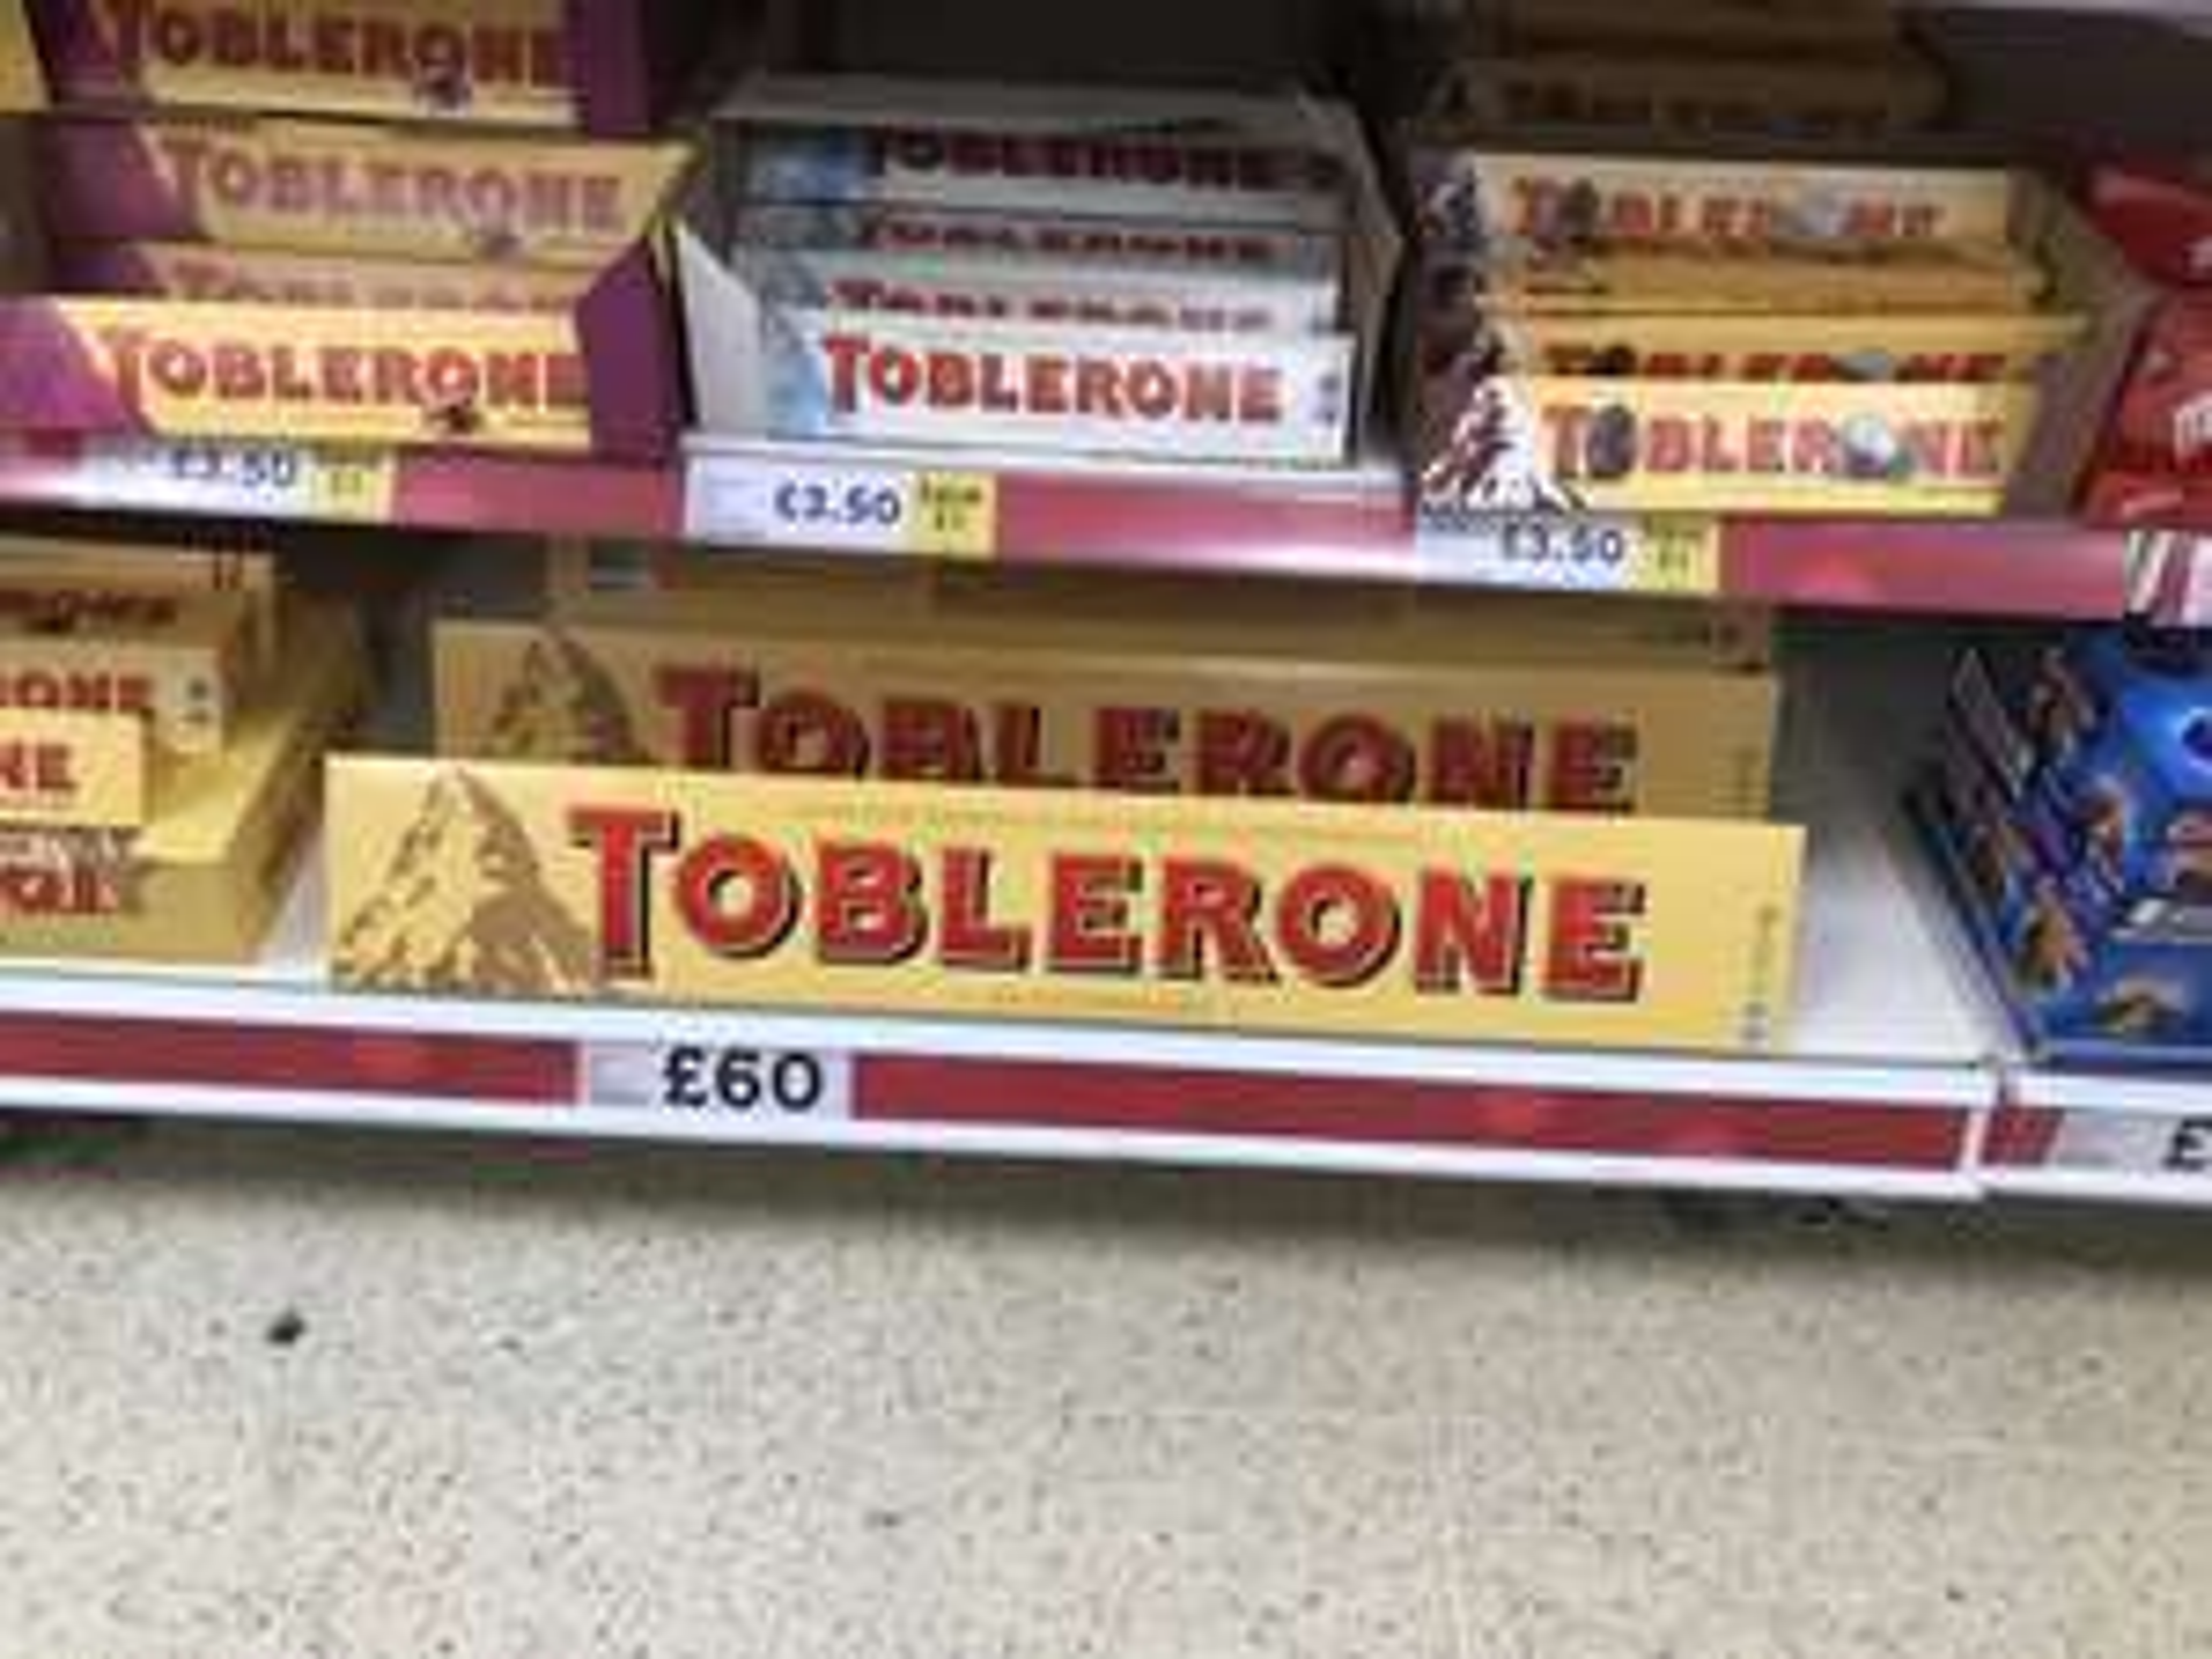 GIANT 4.5kg Toblerone - £60 instore at Tesco